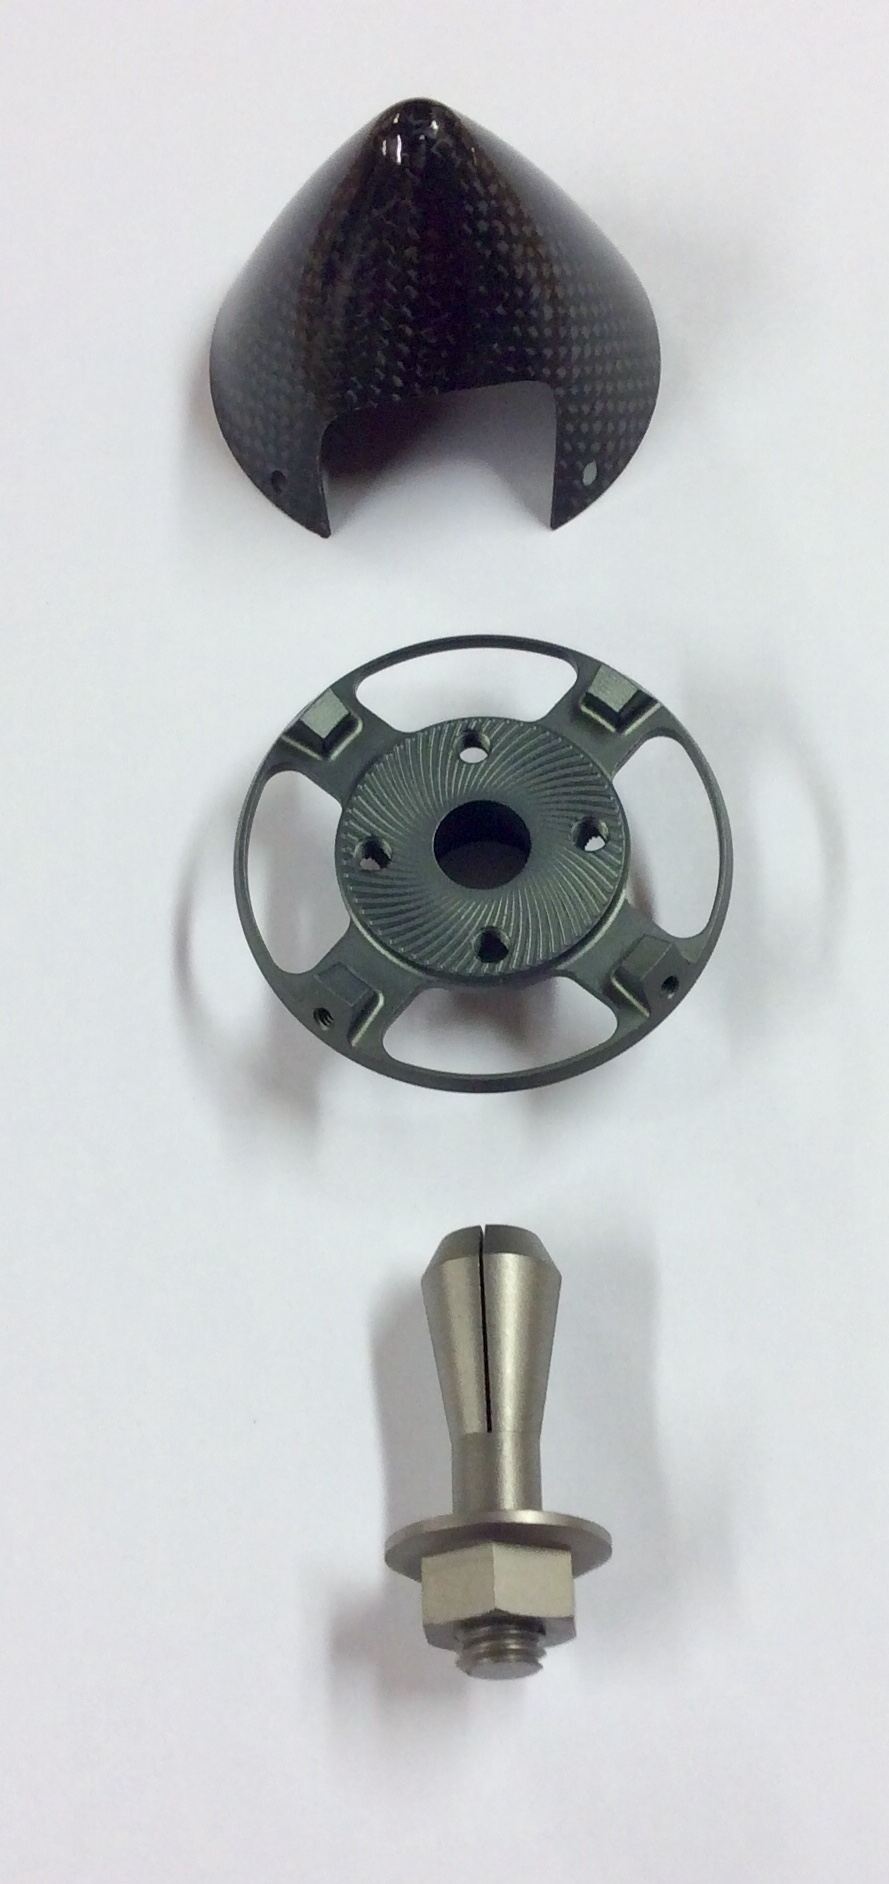 Carbon Black Metallic: Falcon 89mm CRS Spinner Set